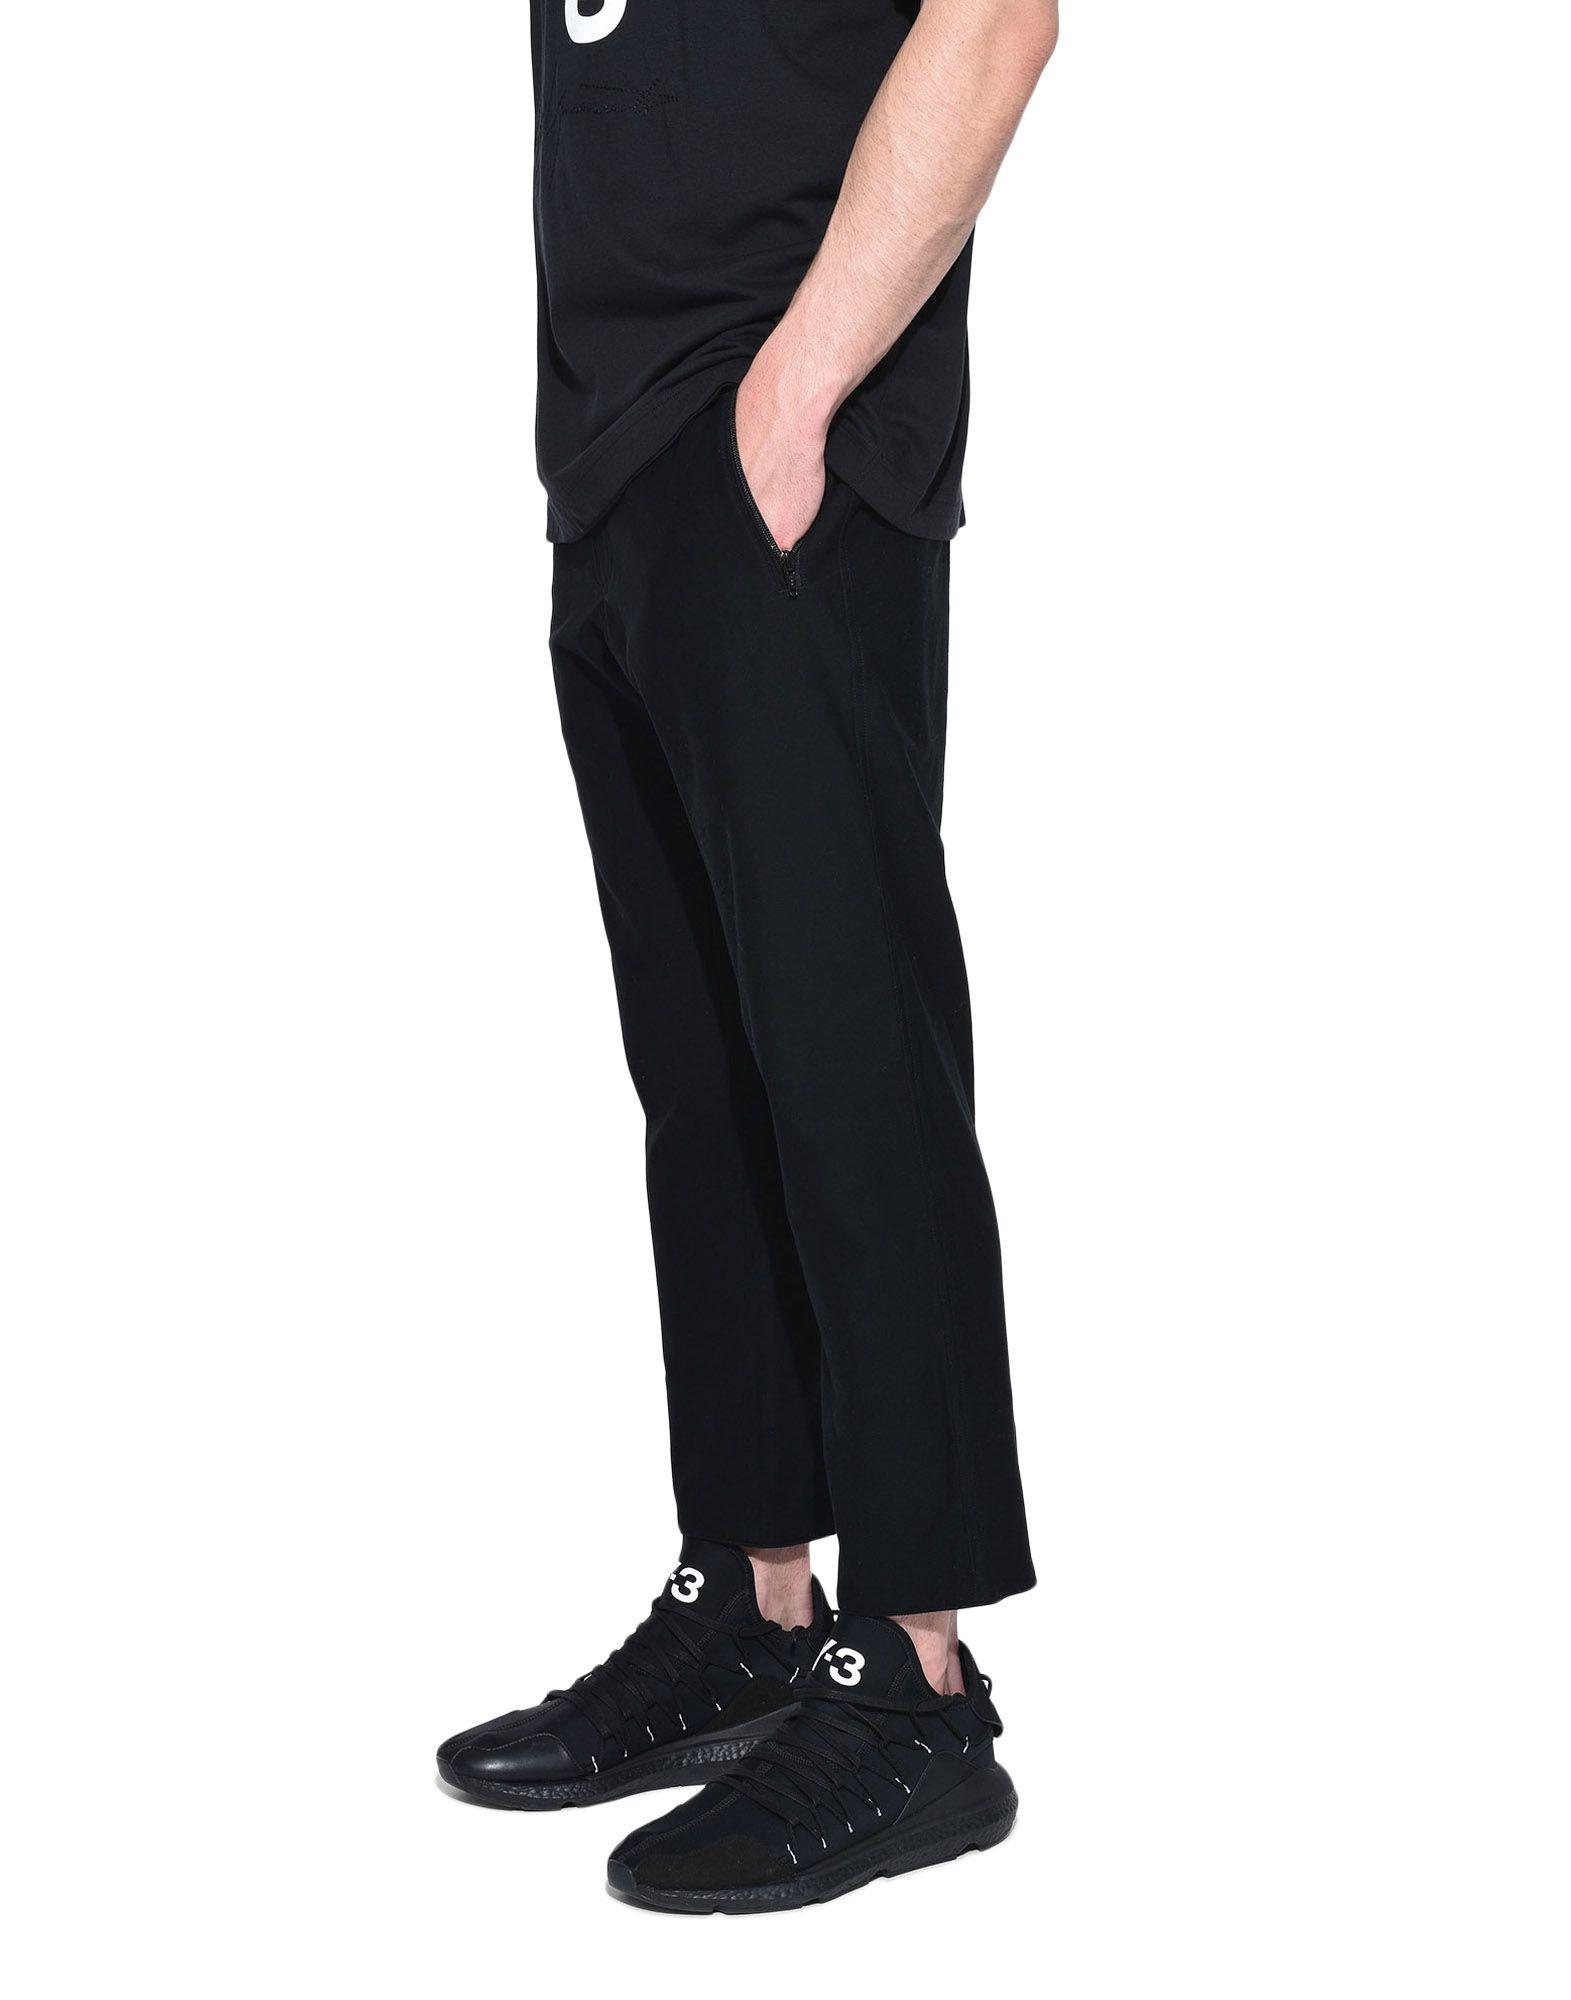 Y-3 Y-3 Twill Cropped Pants Hose Herren e